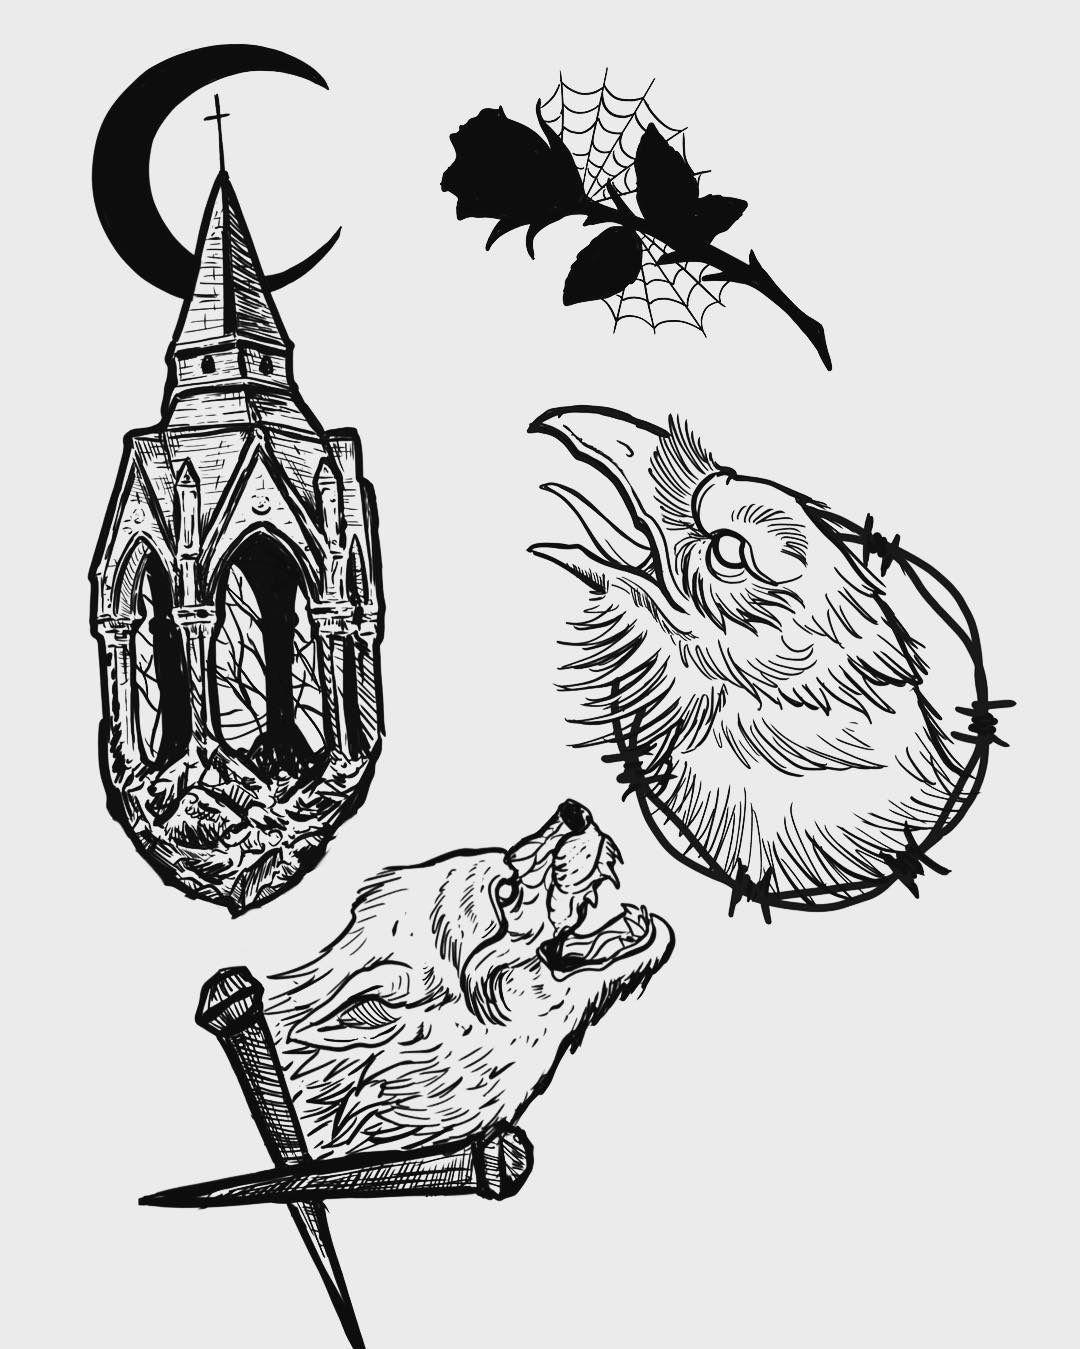 Bocetos De Tatuajes Tradicionales pin de hector morales en tatuajes xd | bocetos, tatuajes